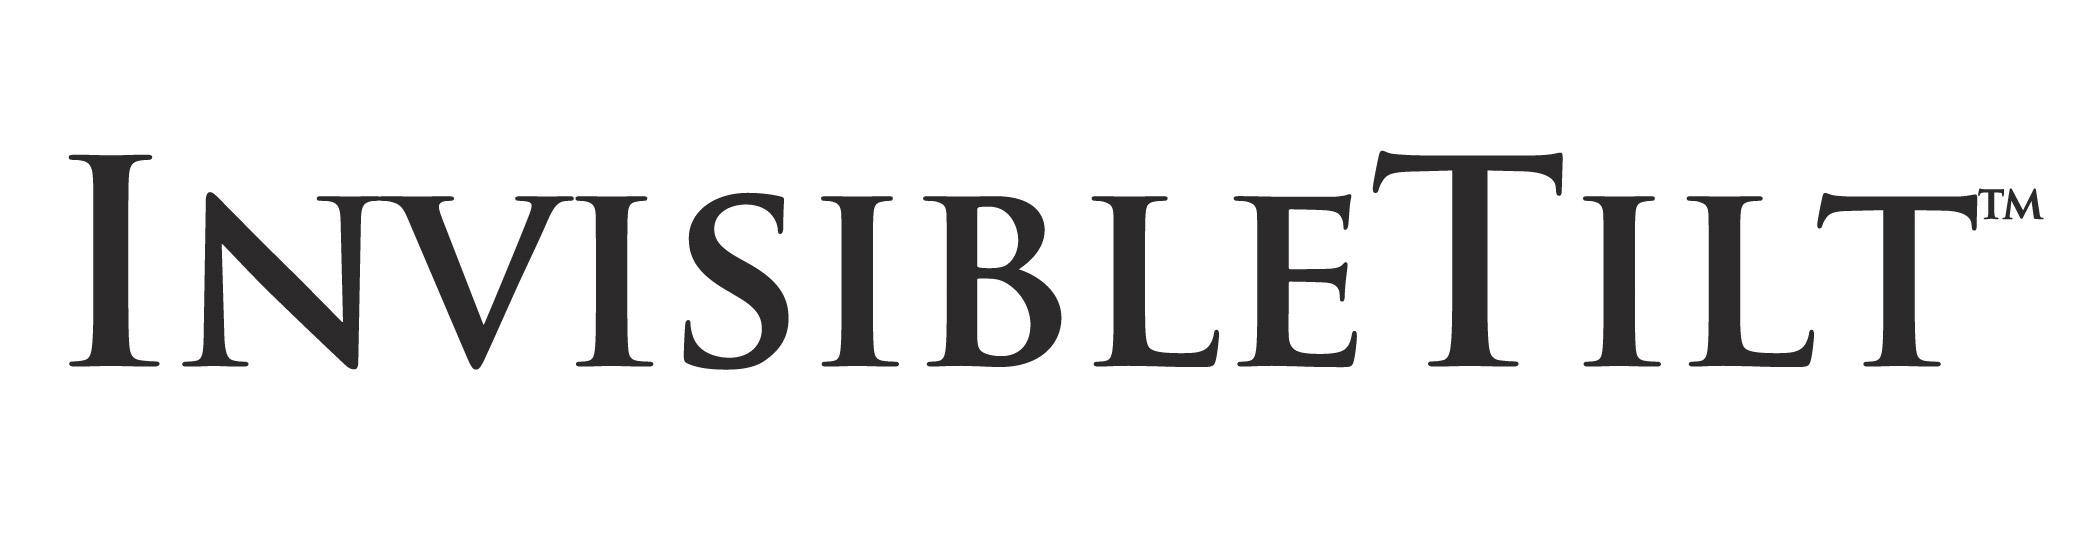 invisibletilt